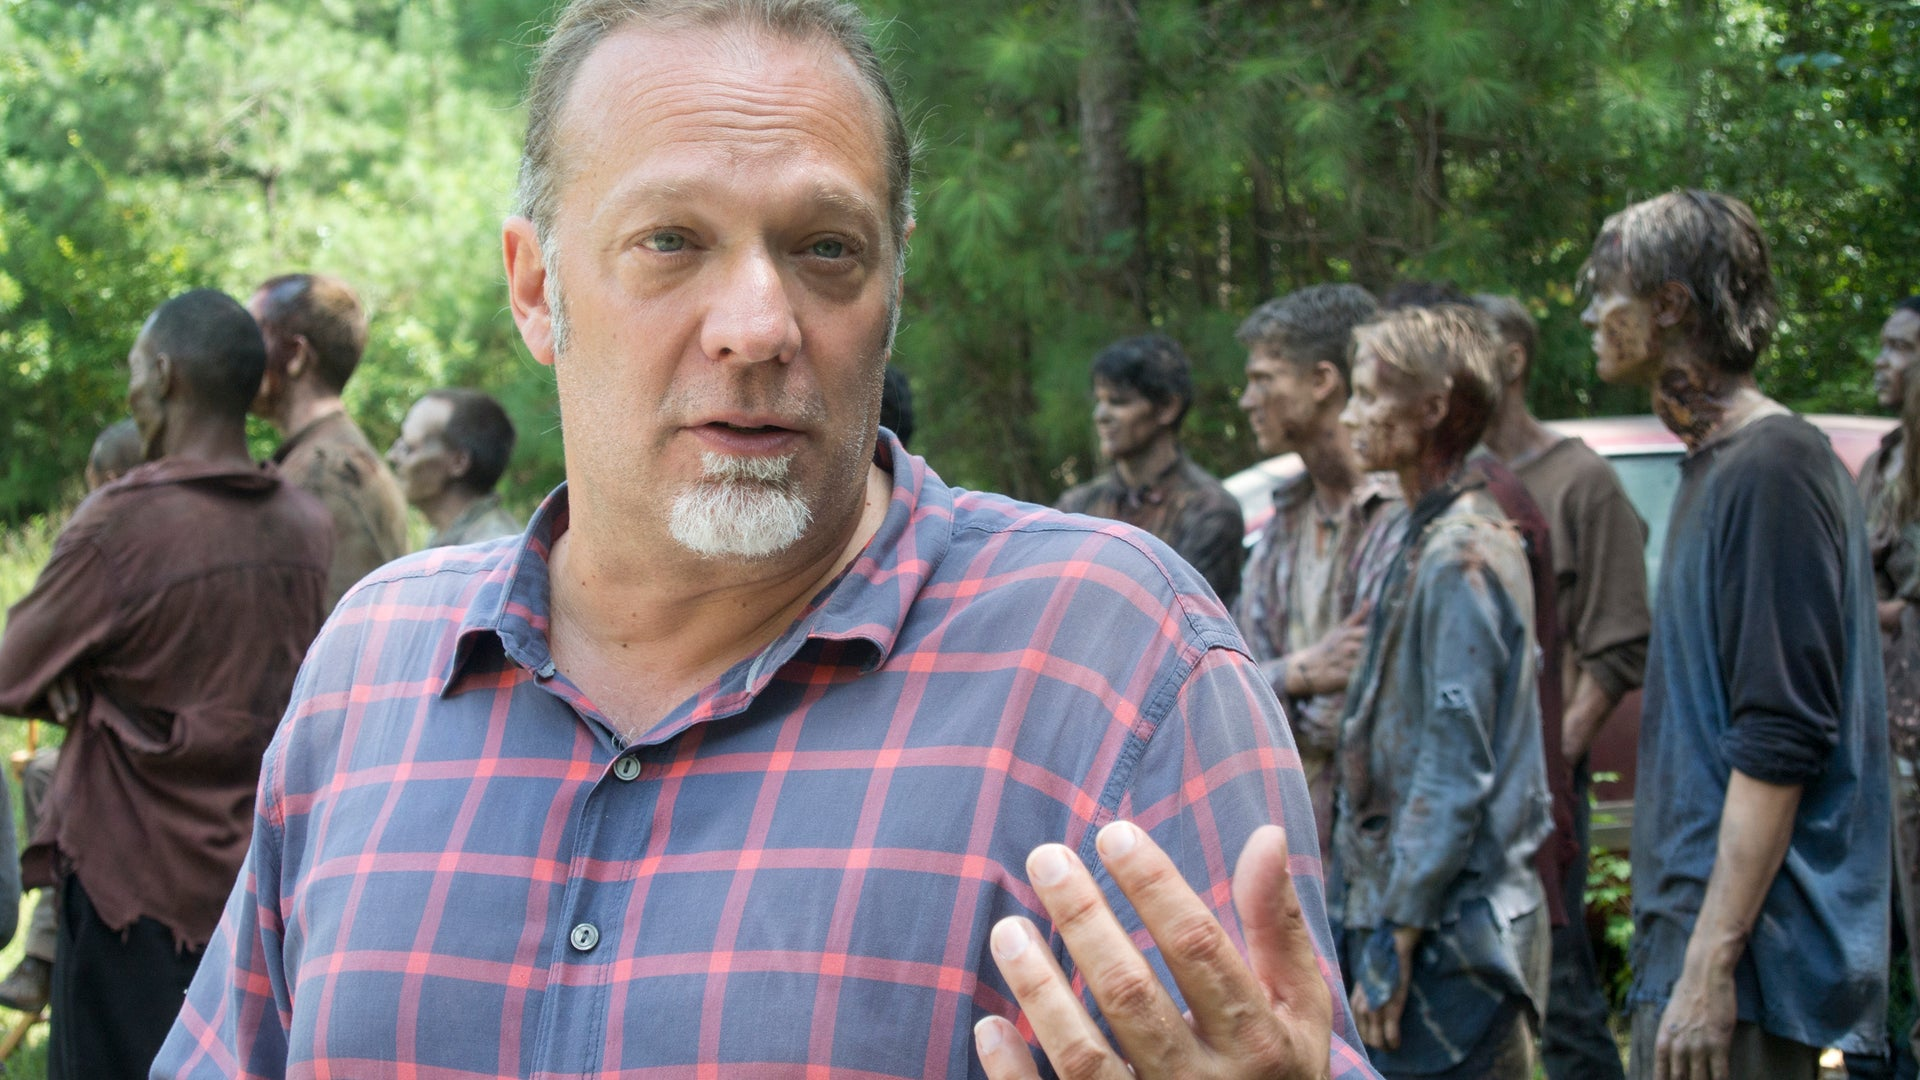 CoExecutive Producer/SFX Makeup Supervisor Greg Nicotero and Walkers, The Walking Dead - Season 4, Episode 9